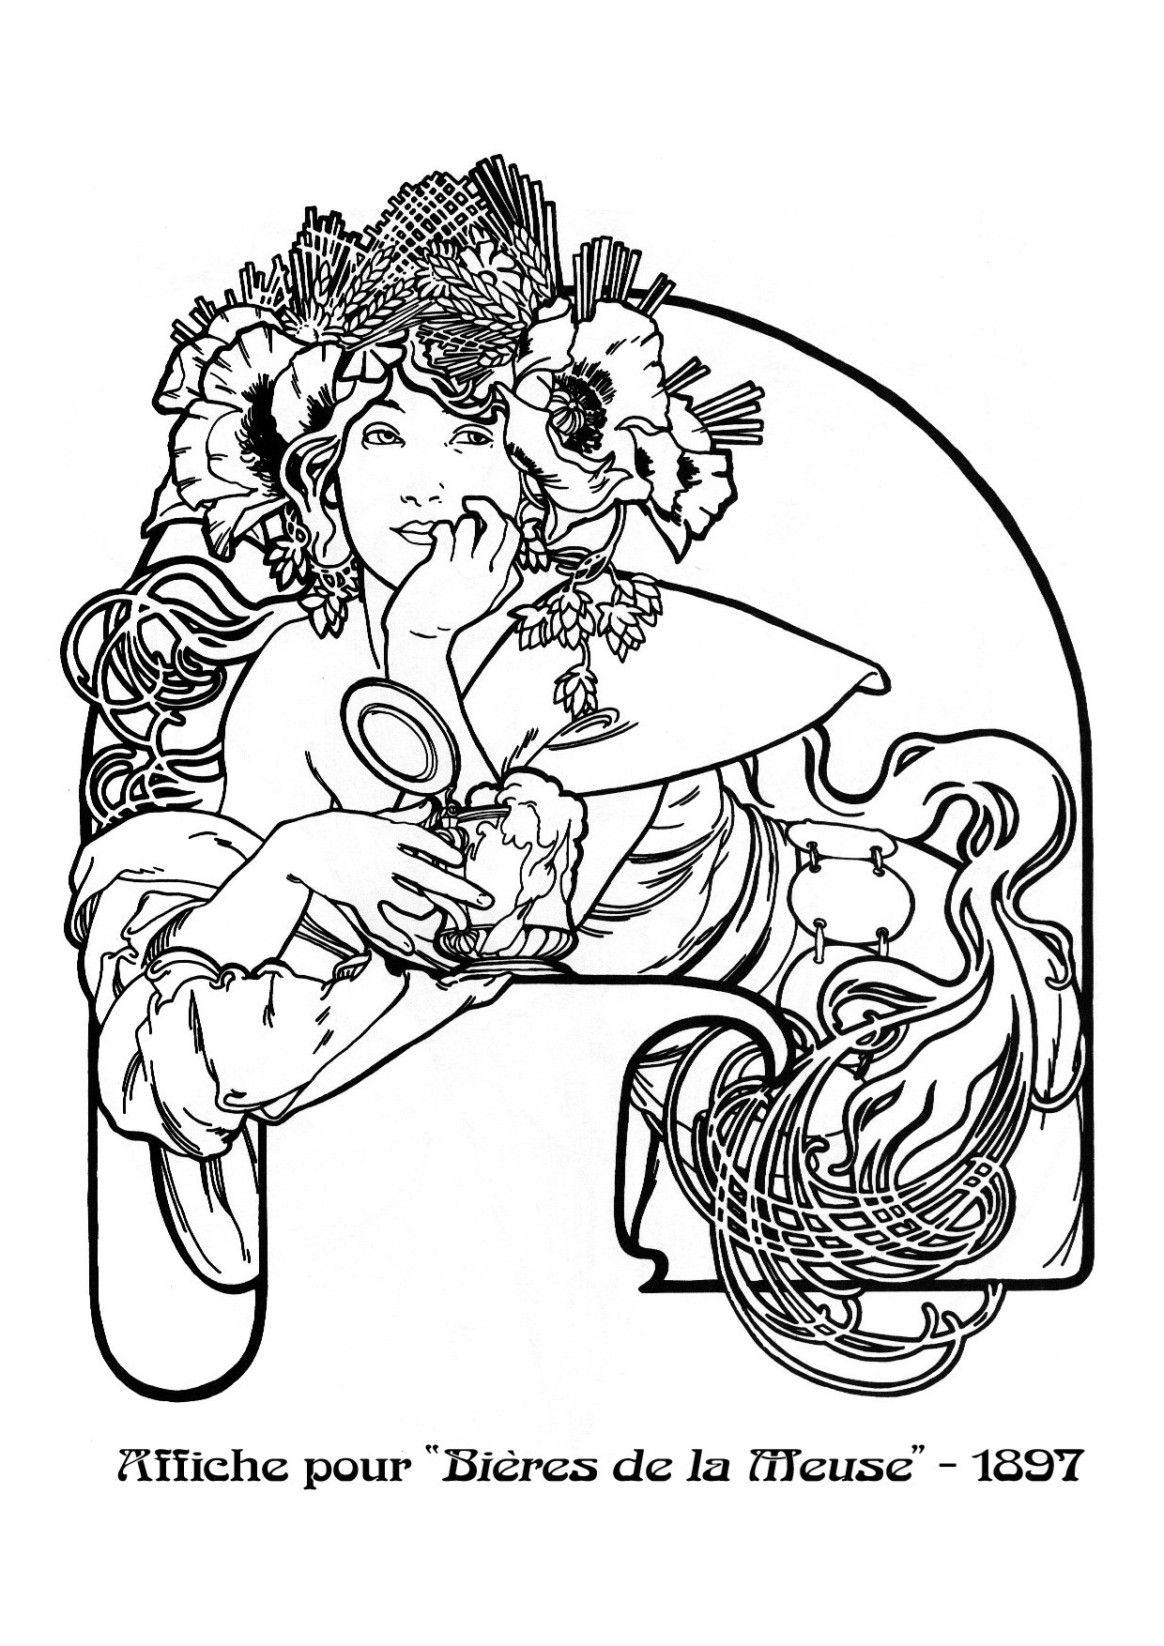 Kleurplaten Naar A Mucha Pin Via Dromenvangers Winkeltje Patroon Tekening Prent Sjabloon Bieres De La Meuse 18 Mucha Art Art Nouveau Illustration Mucha